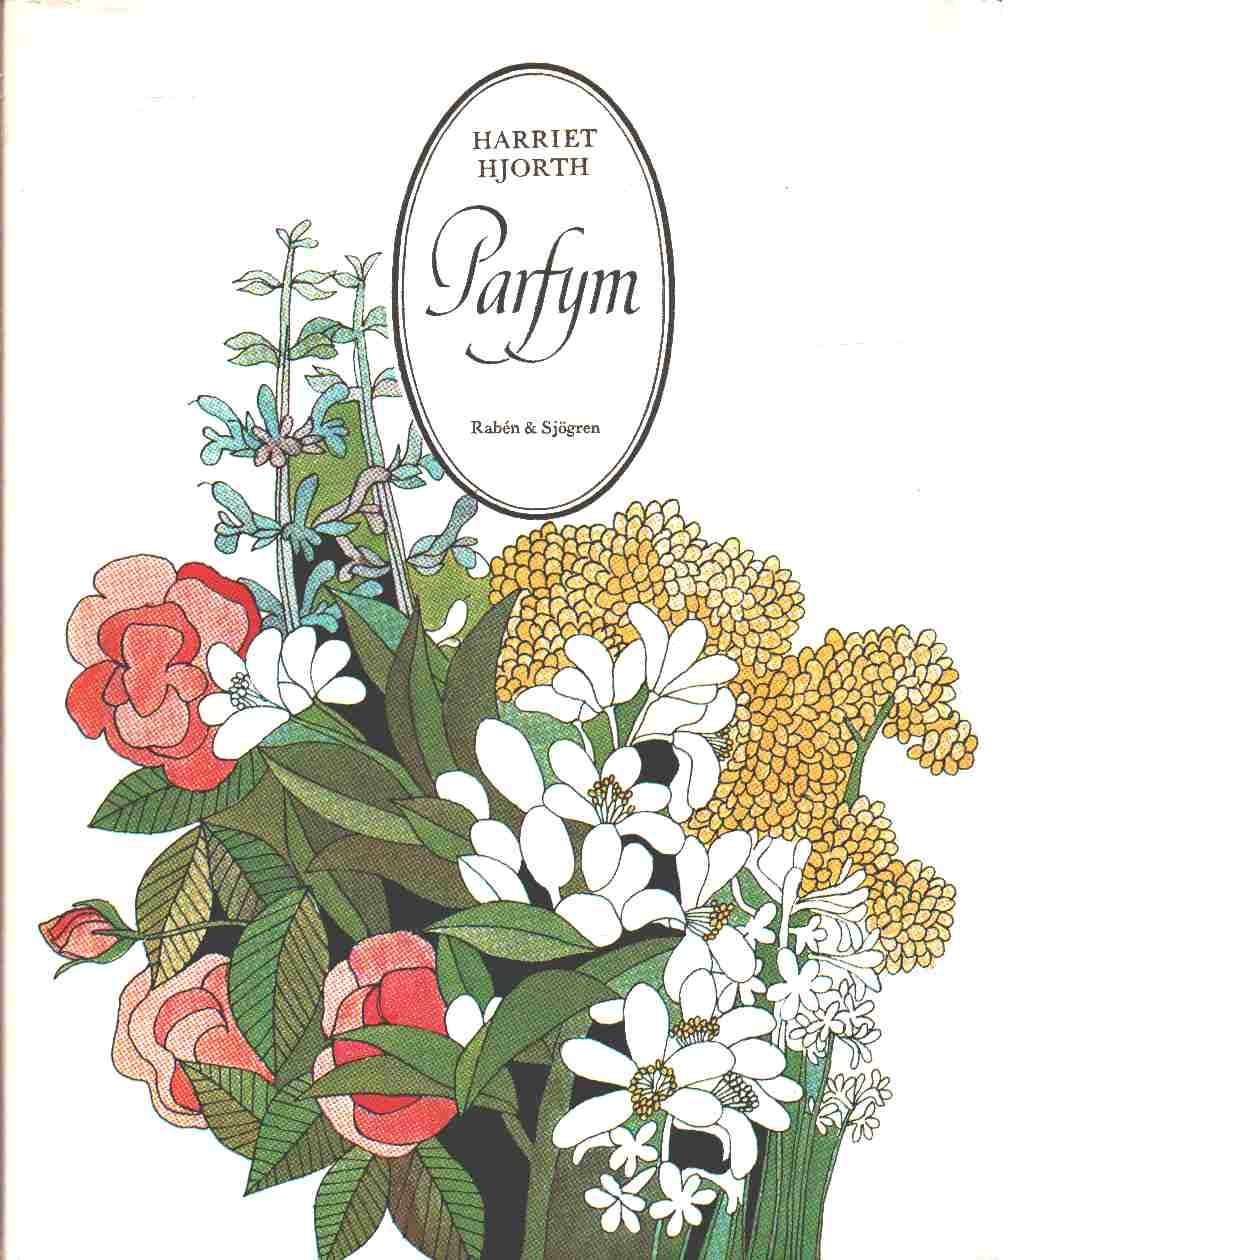 Parfym - Hjorth, Harriet